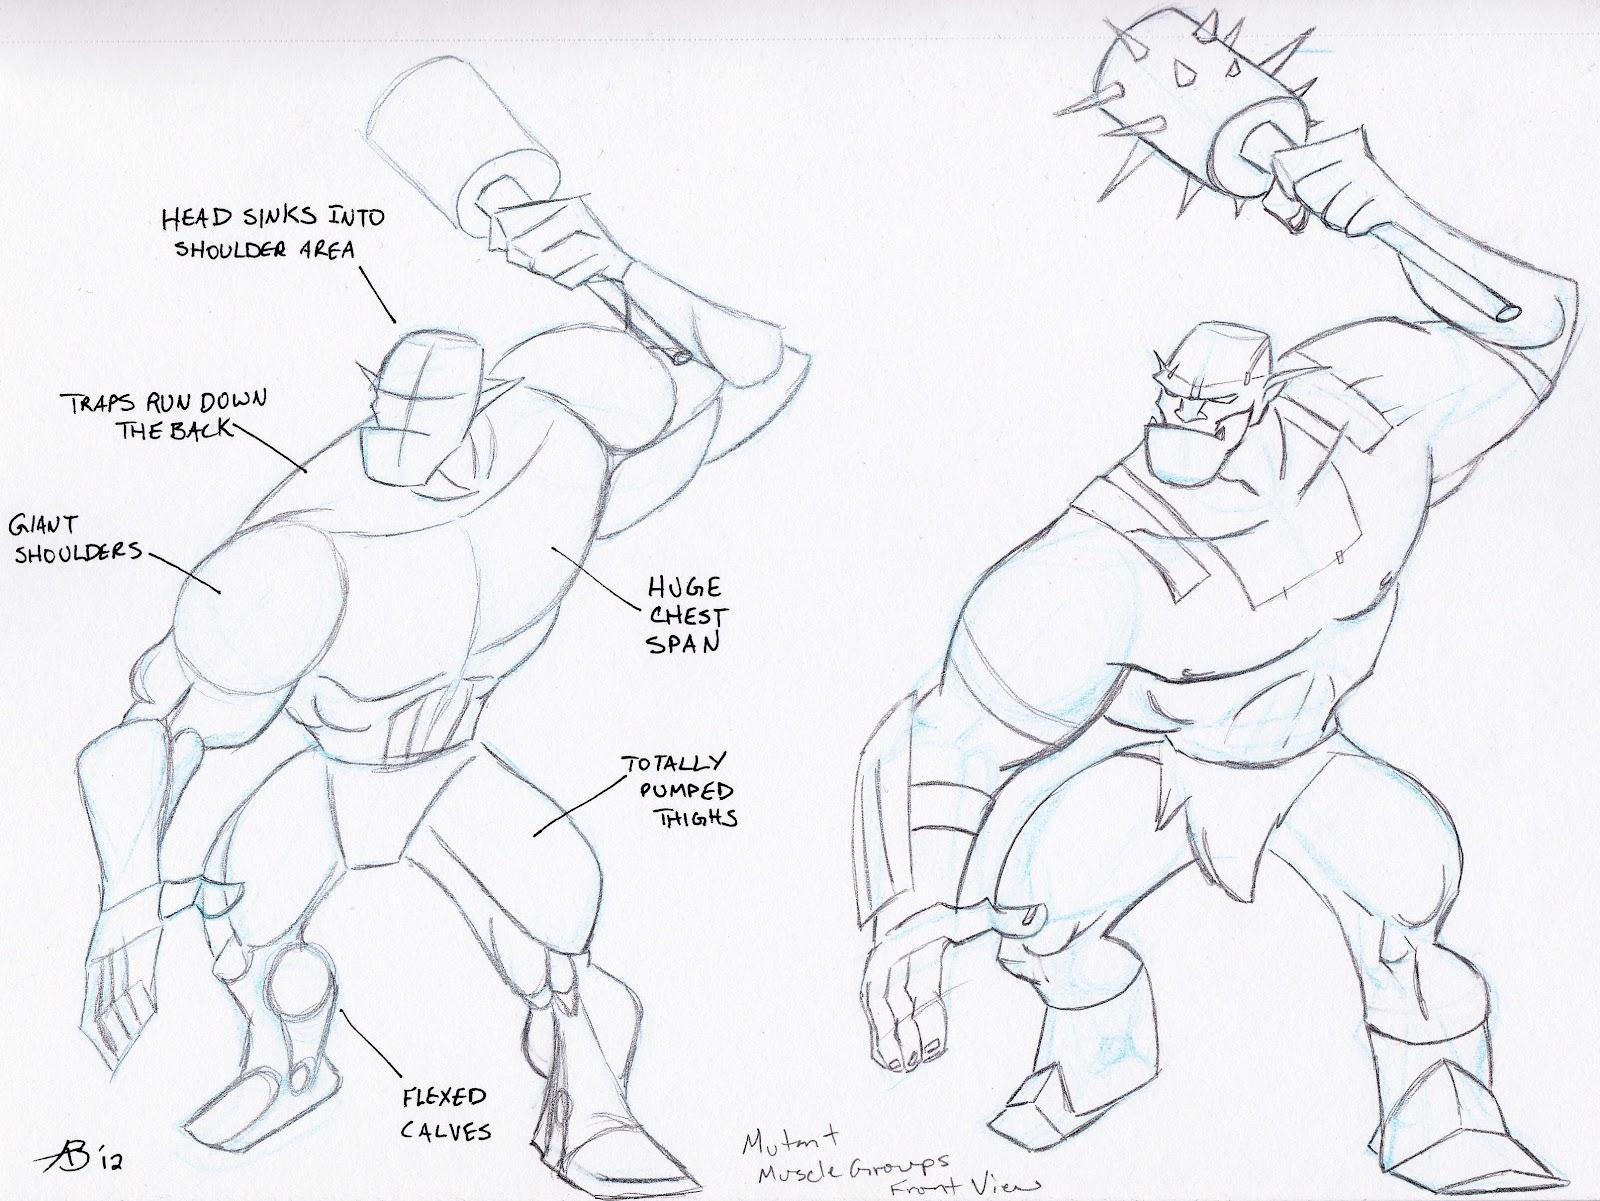 Anthony Bachman Illustrator: 187 - on a mutha funkin Mutant!